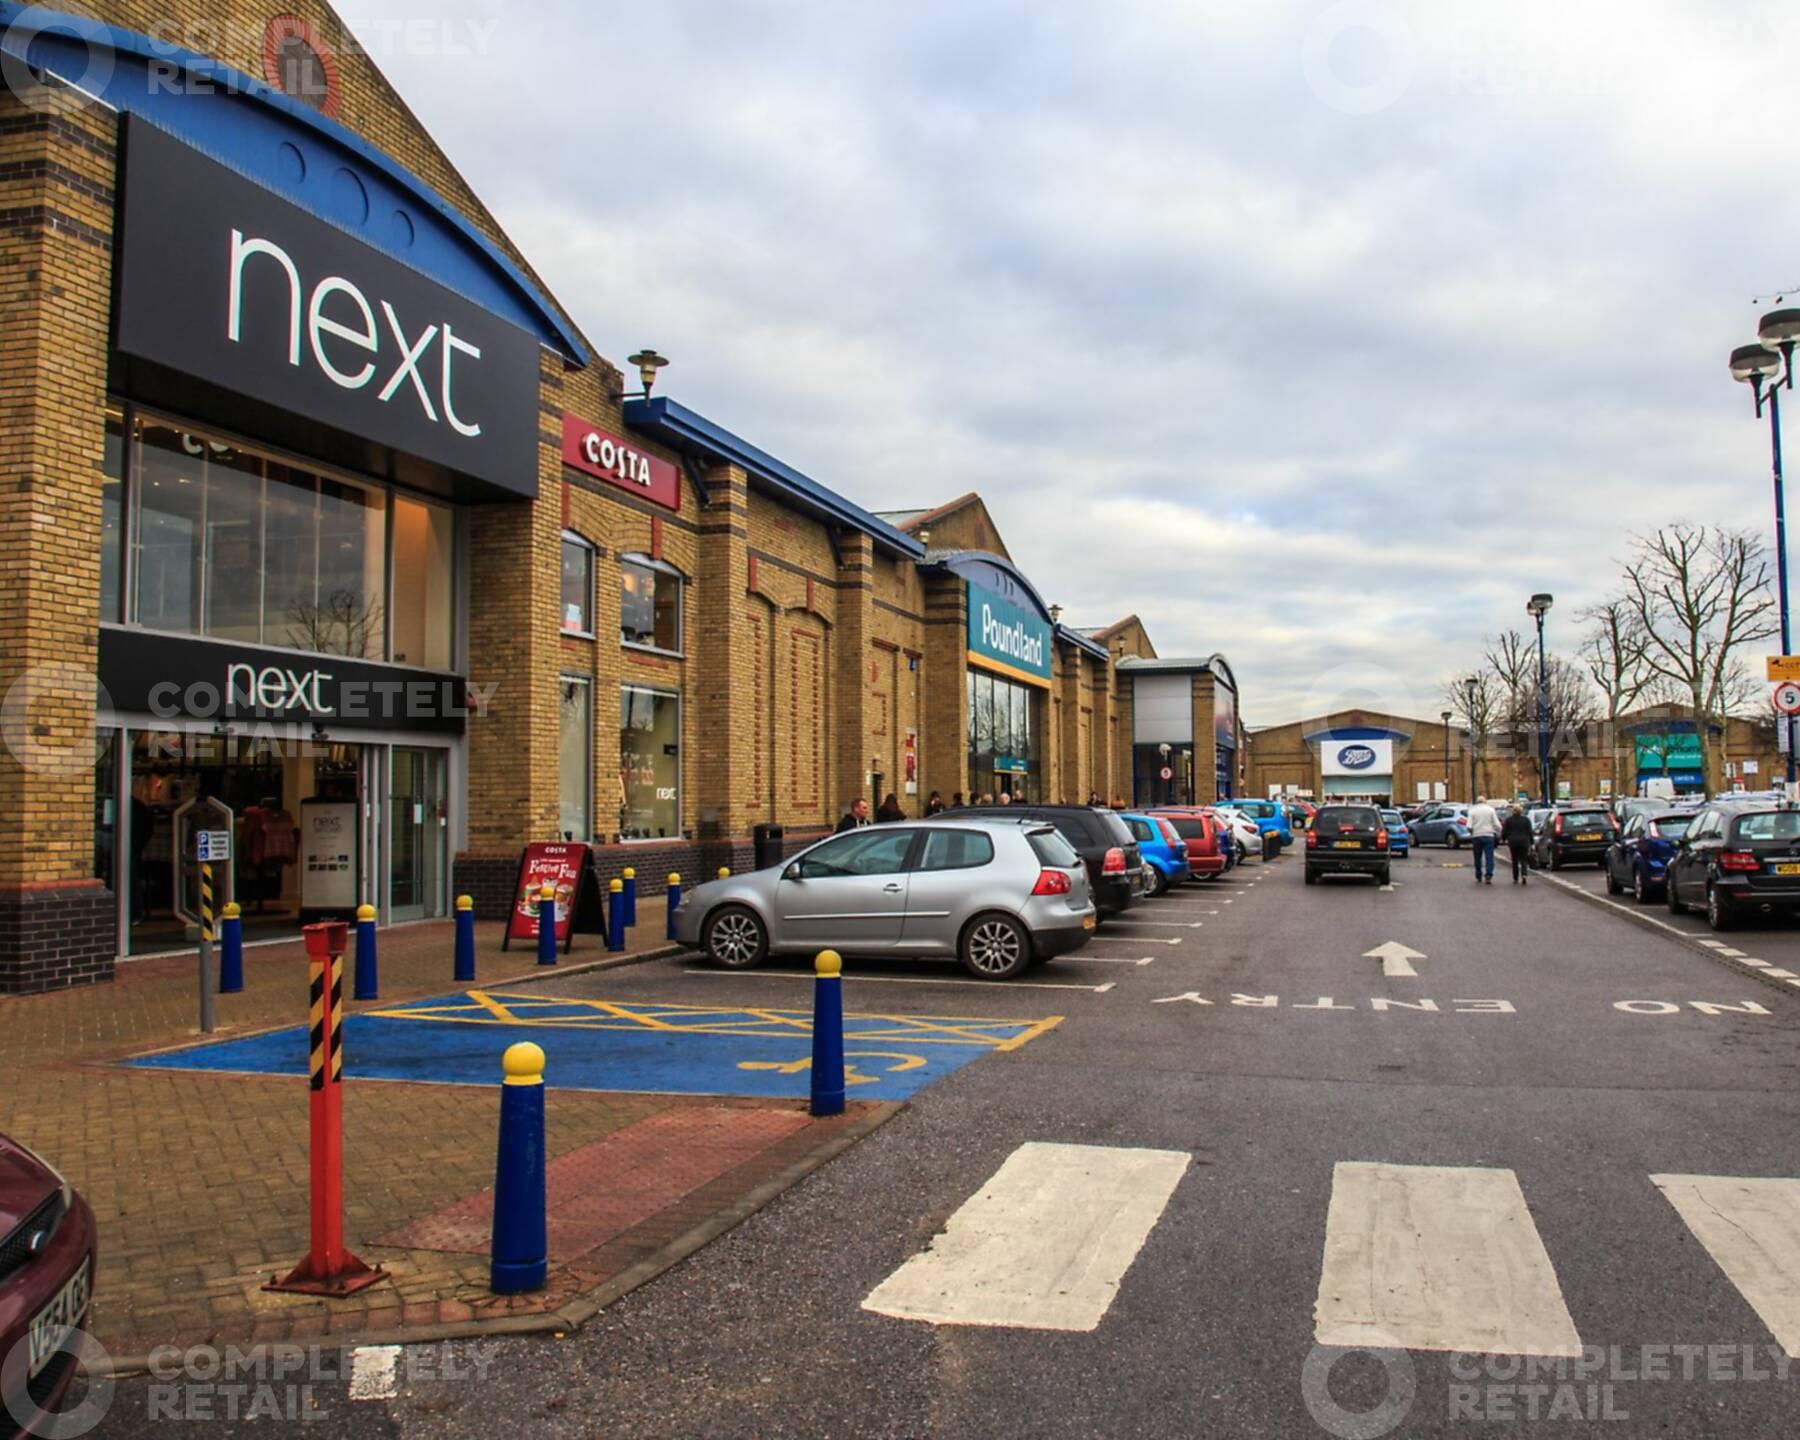 Tower Retail Park